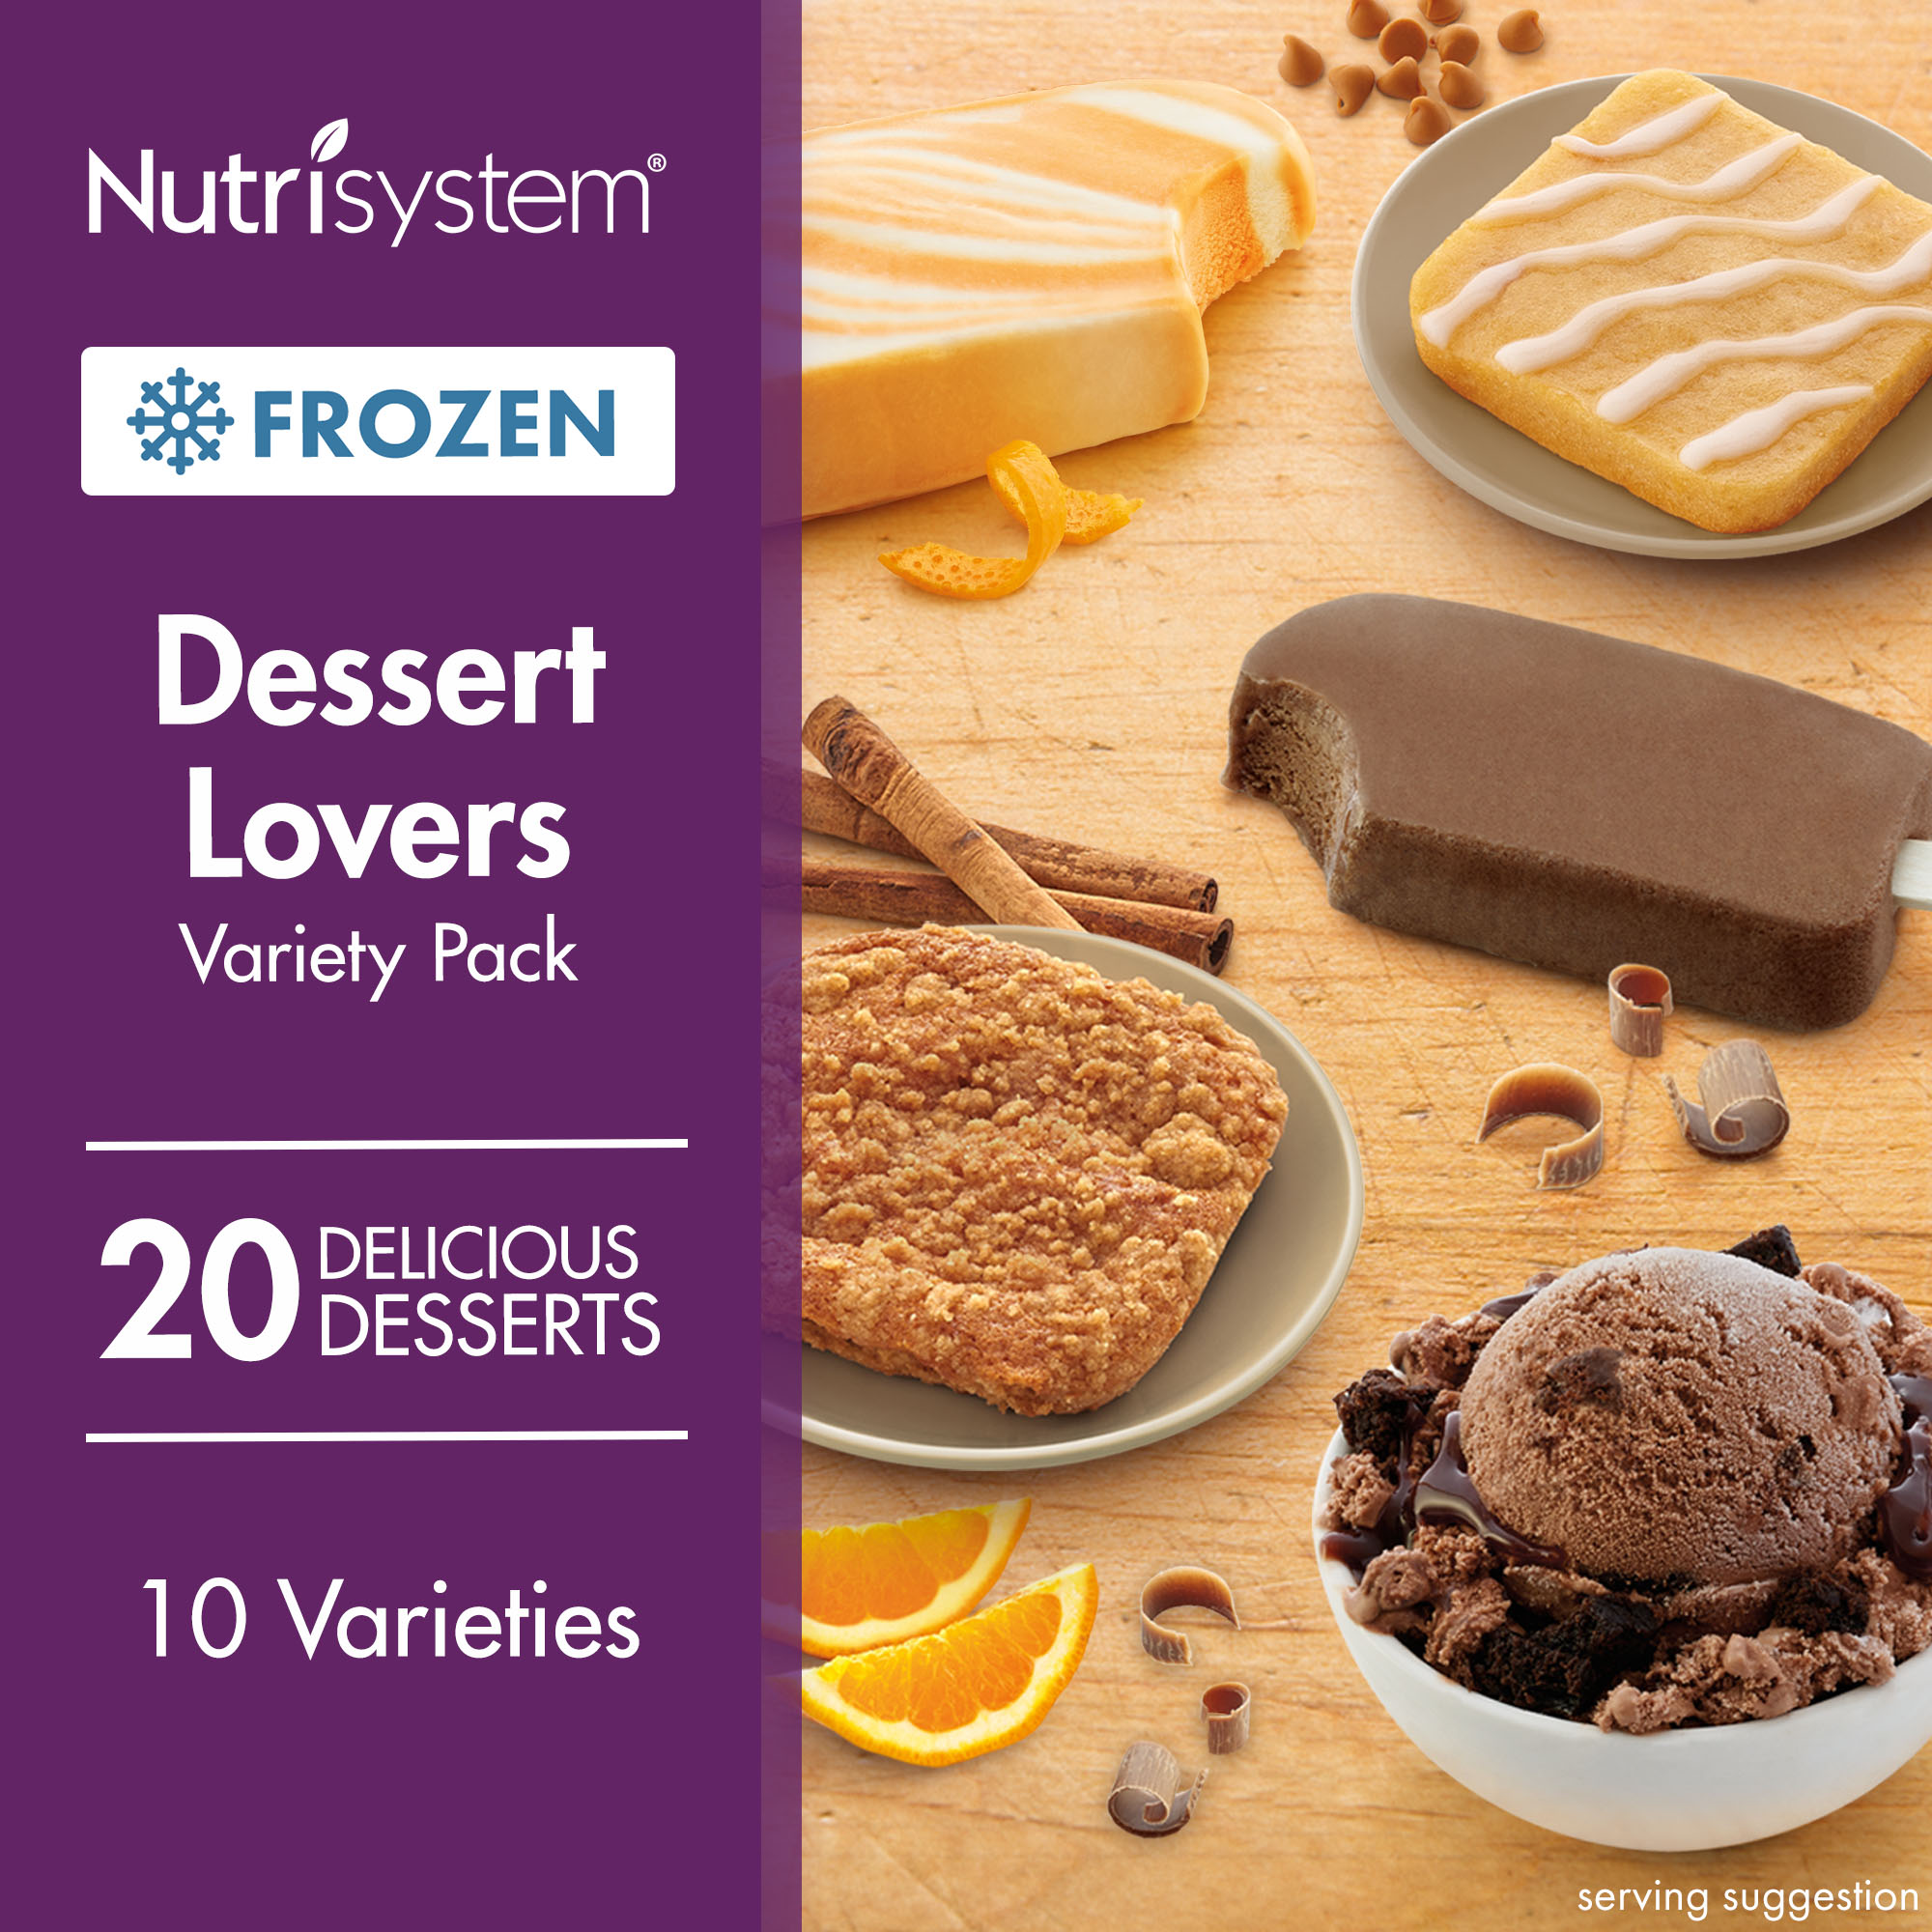 Nutrisystem Frozen Dessert Lovers Variety Pack, 20CT